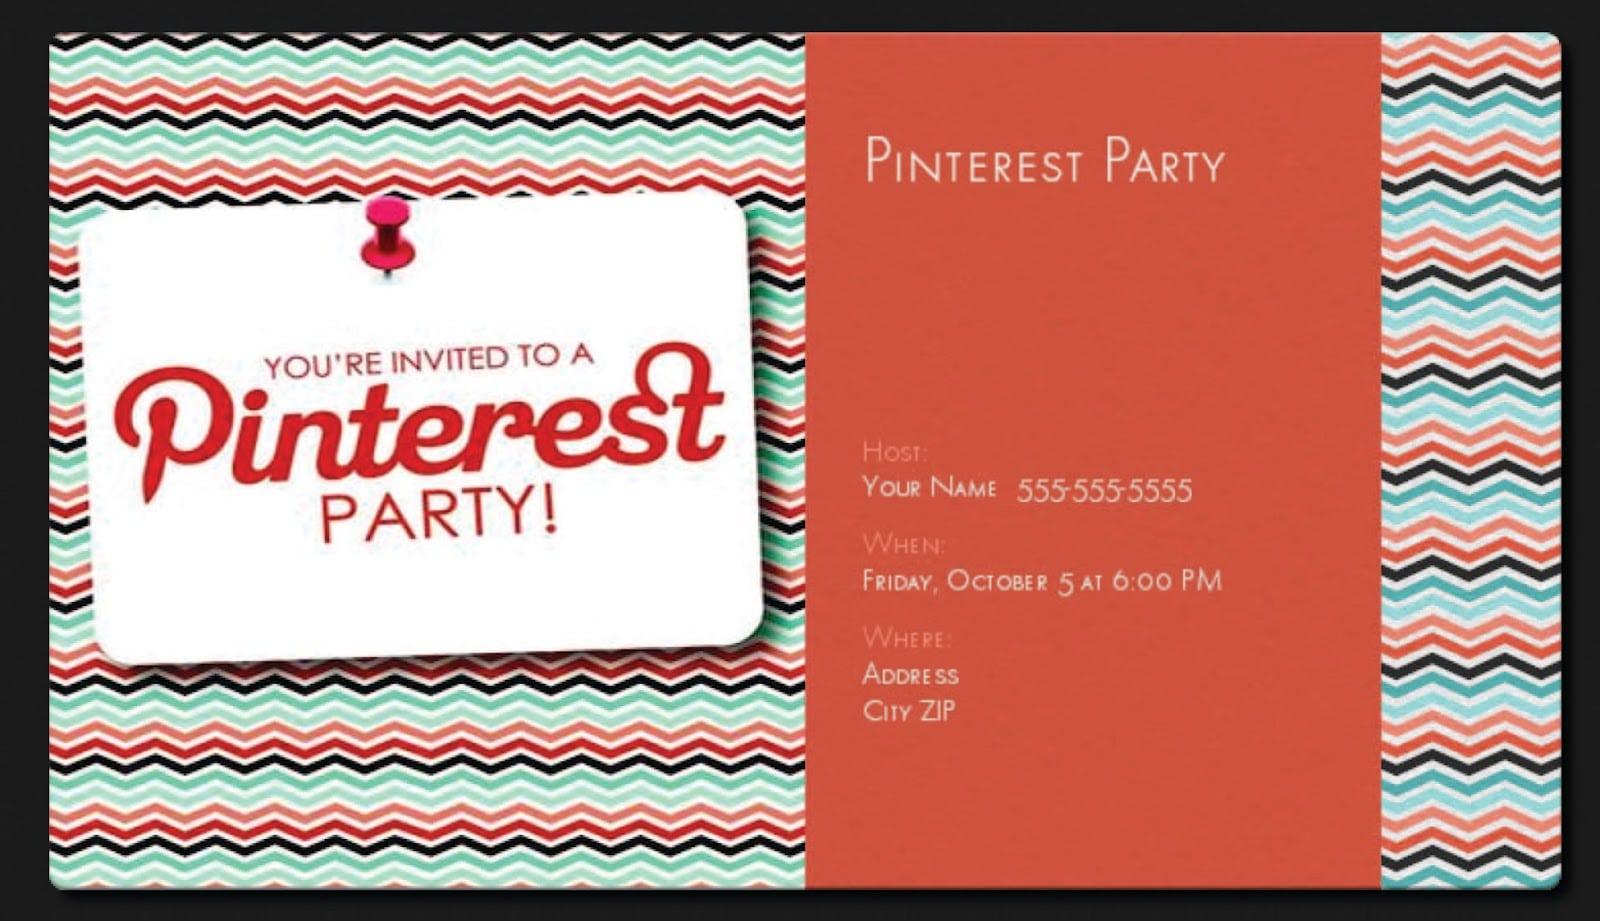 Party Invitations Pinterest